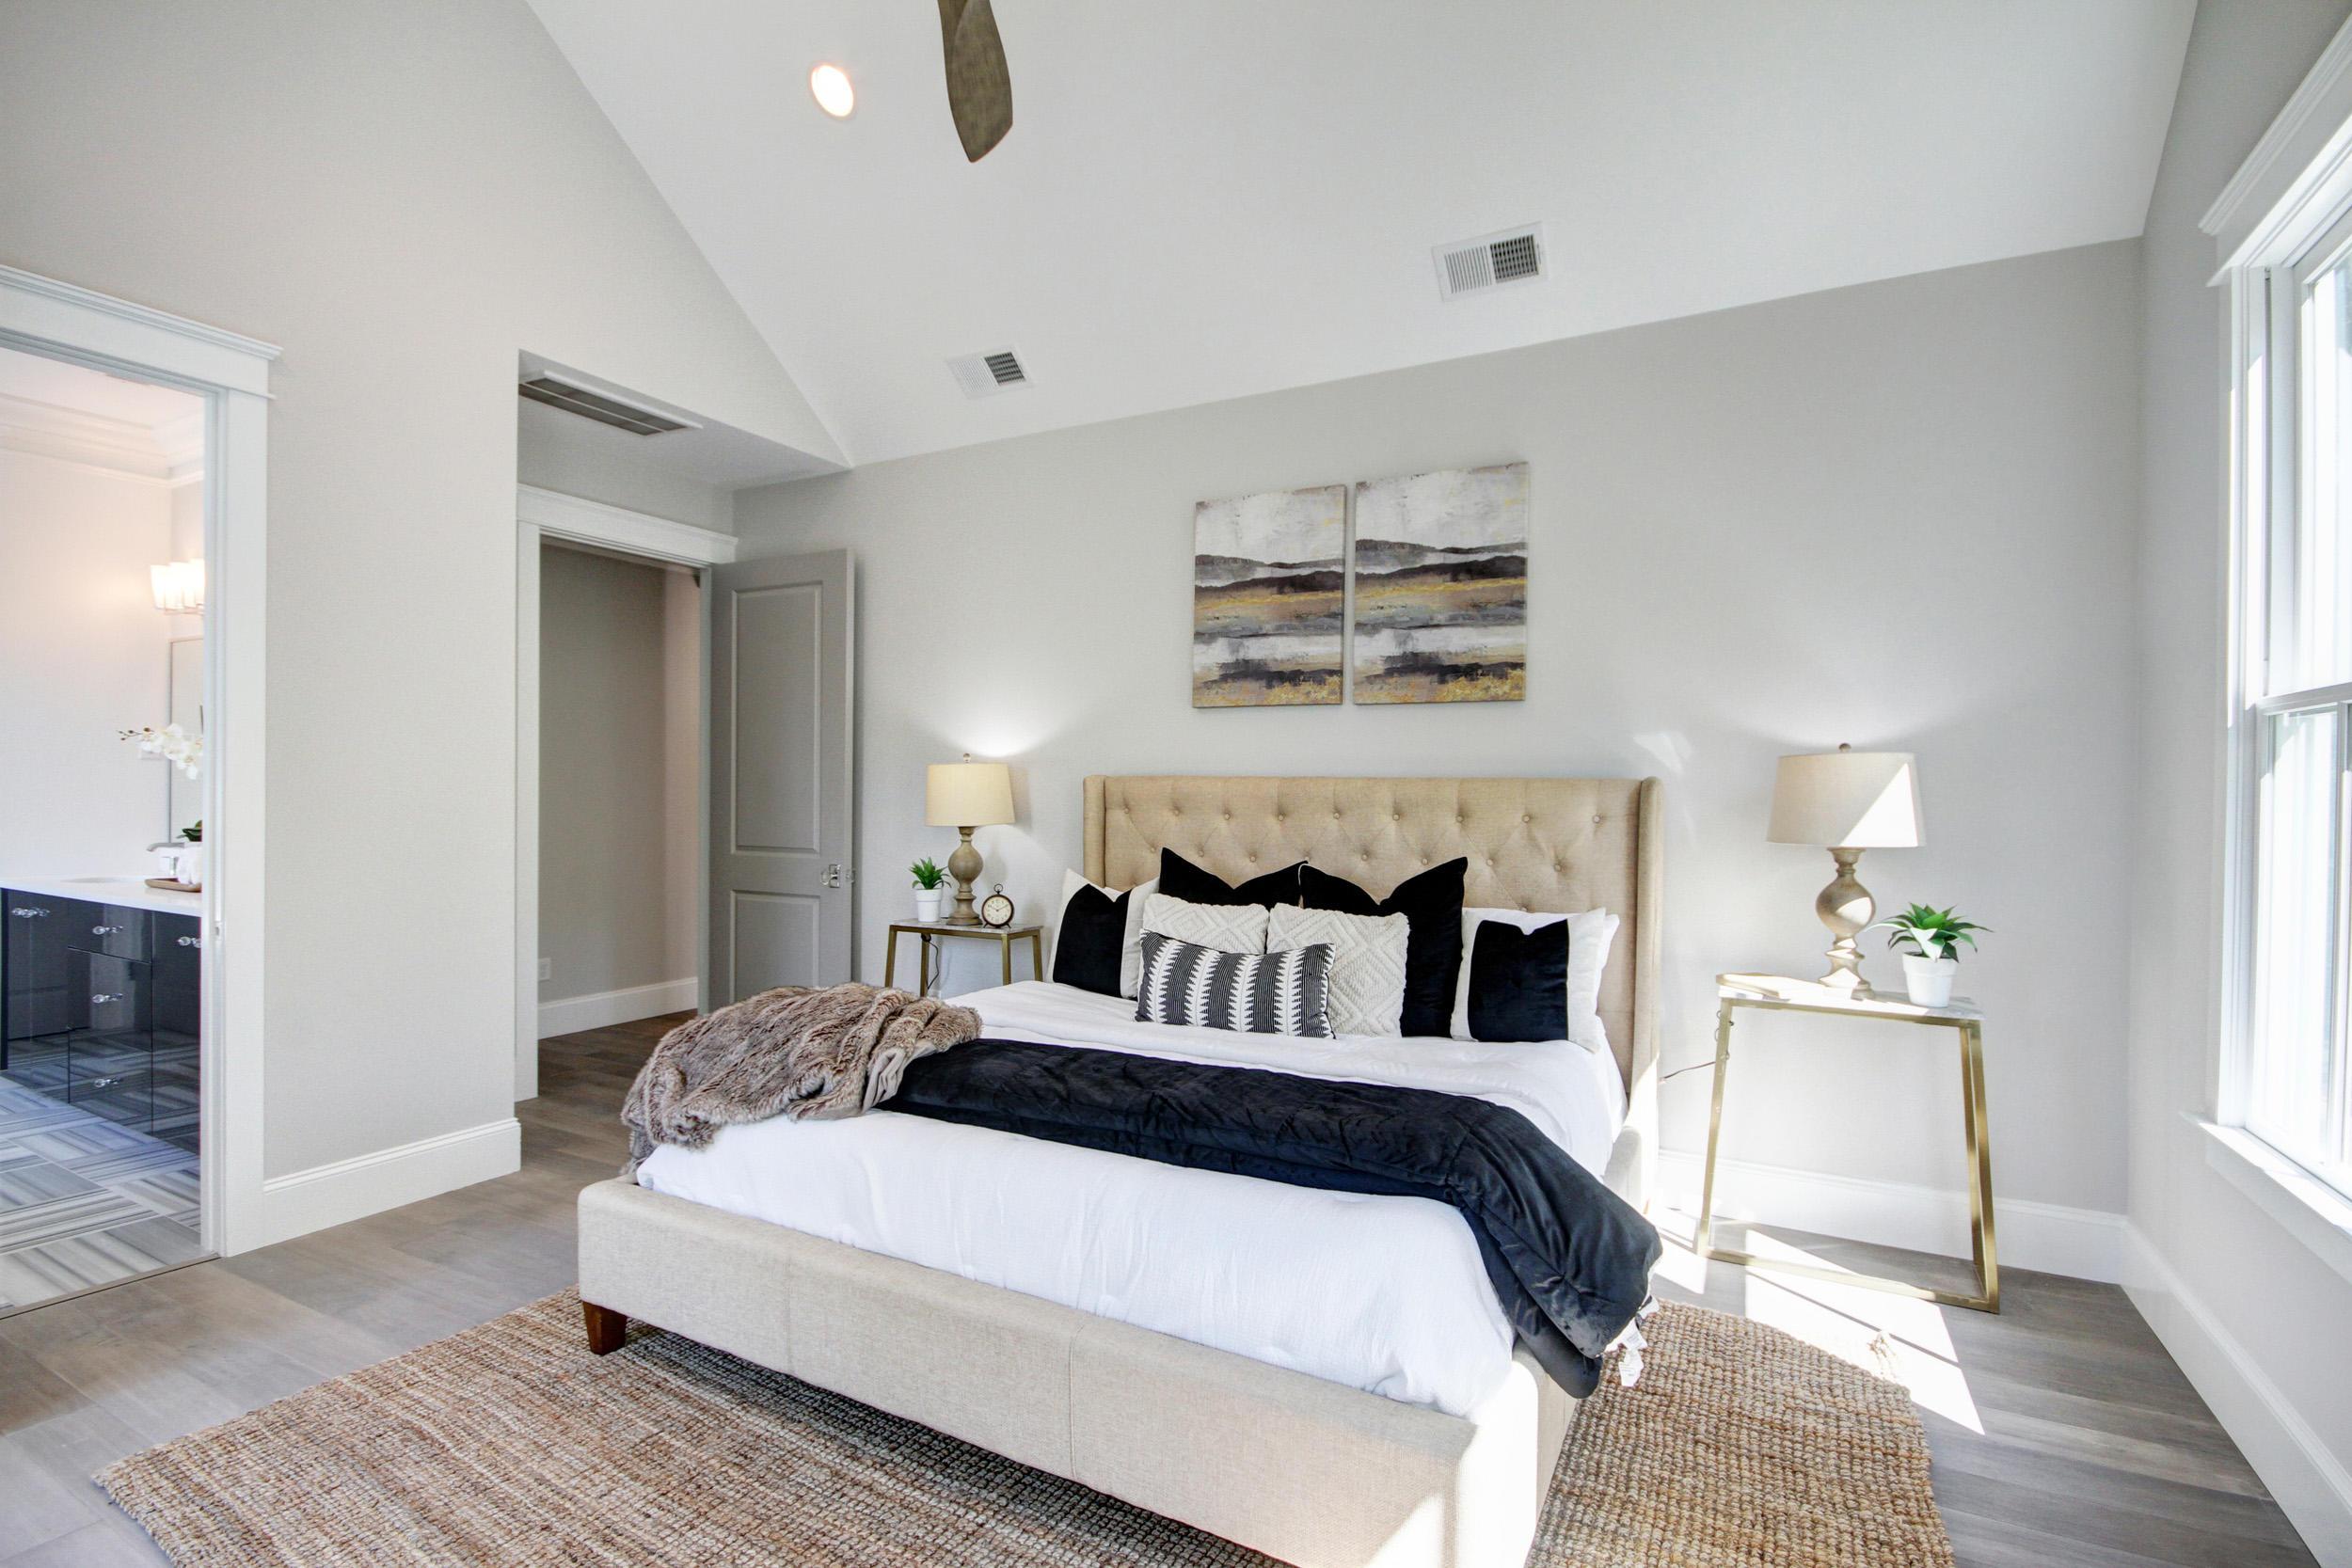 Mathis Ferry Court Homes For Sale - 1212 Clonmel, Mount Pleasant, SC - 34